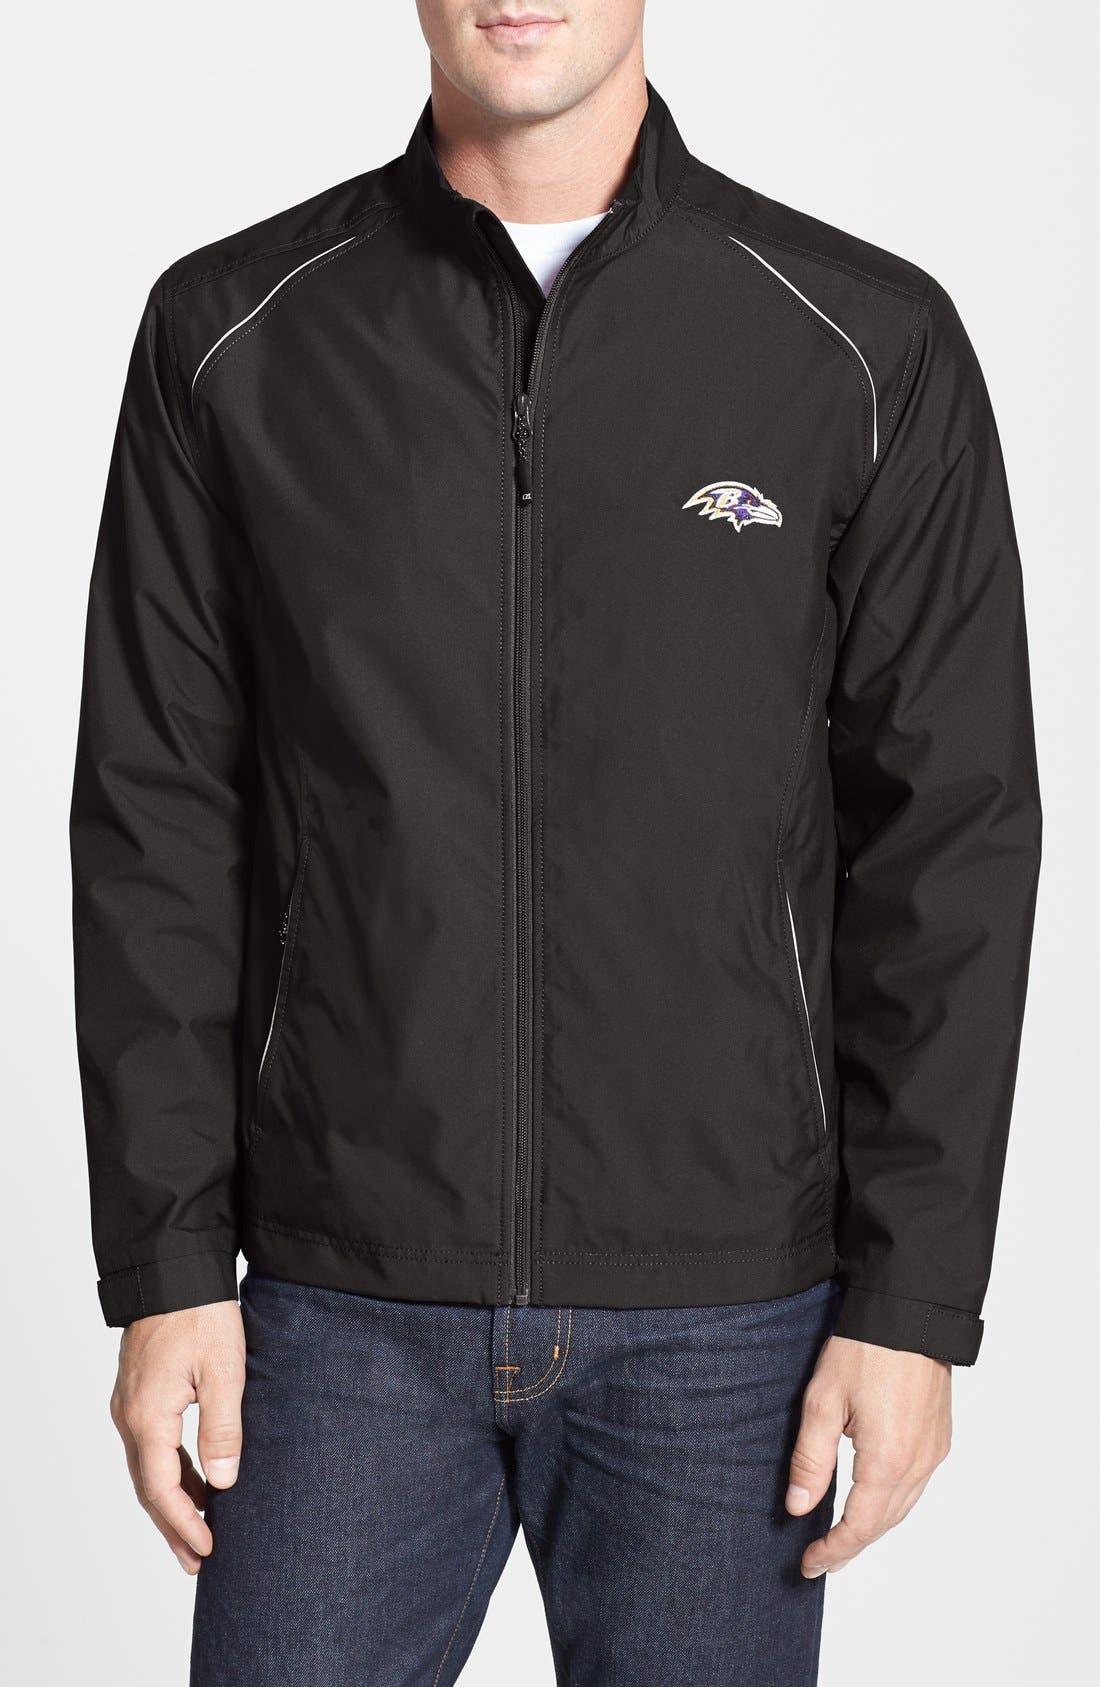 Cutter & Buck Baltimore Ravens - Beacon WeatherTec Wind & Water Resistant Jacket